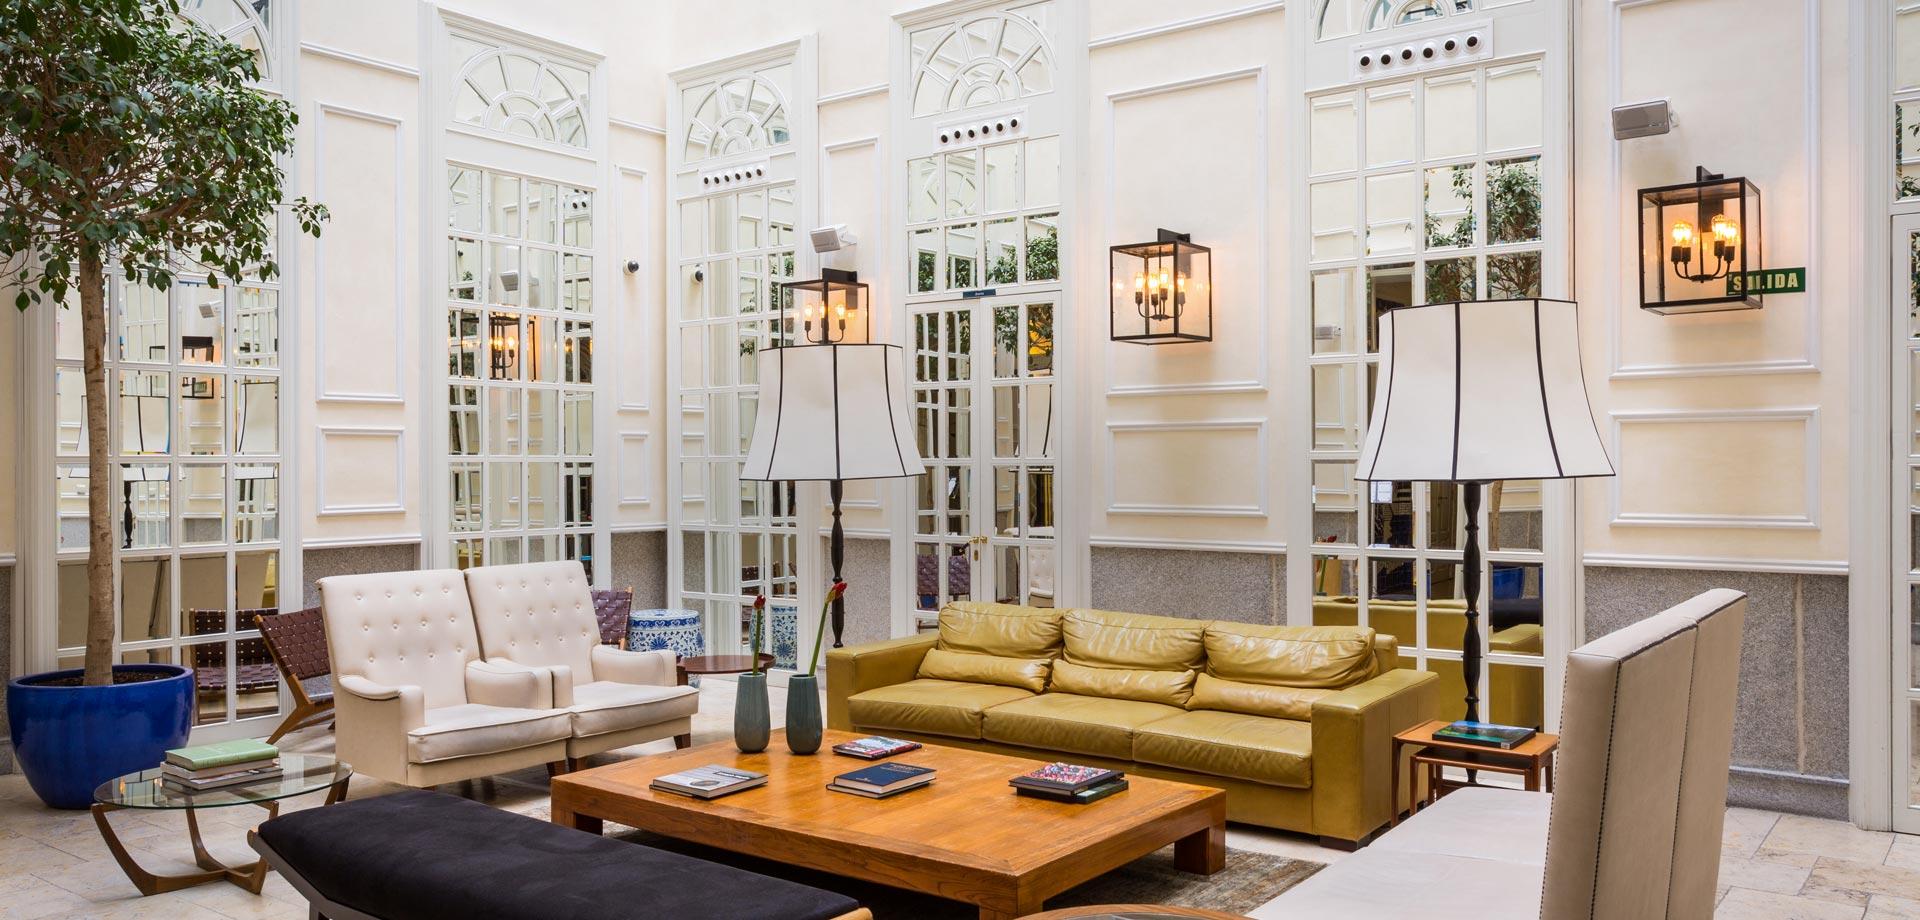 Cartagena Spain Boutique Hotels